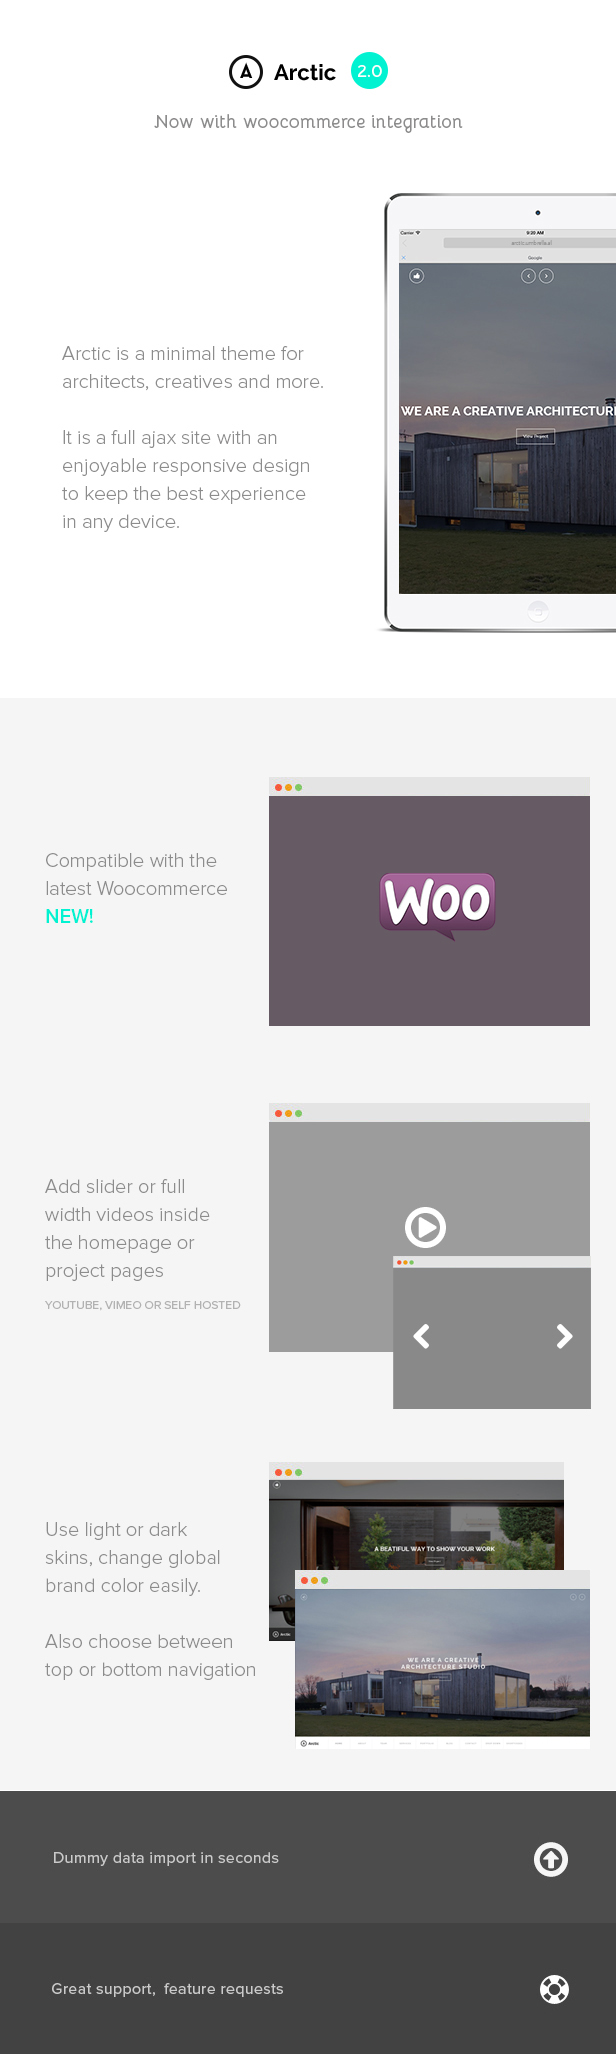 Arctic - Architecture & Creatives WordPress Theme - 4